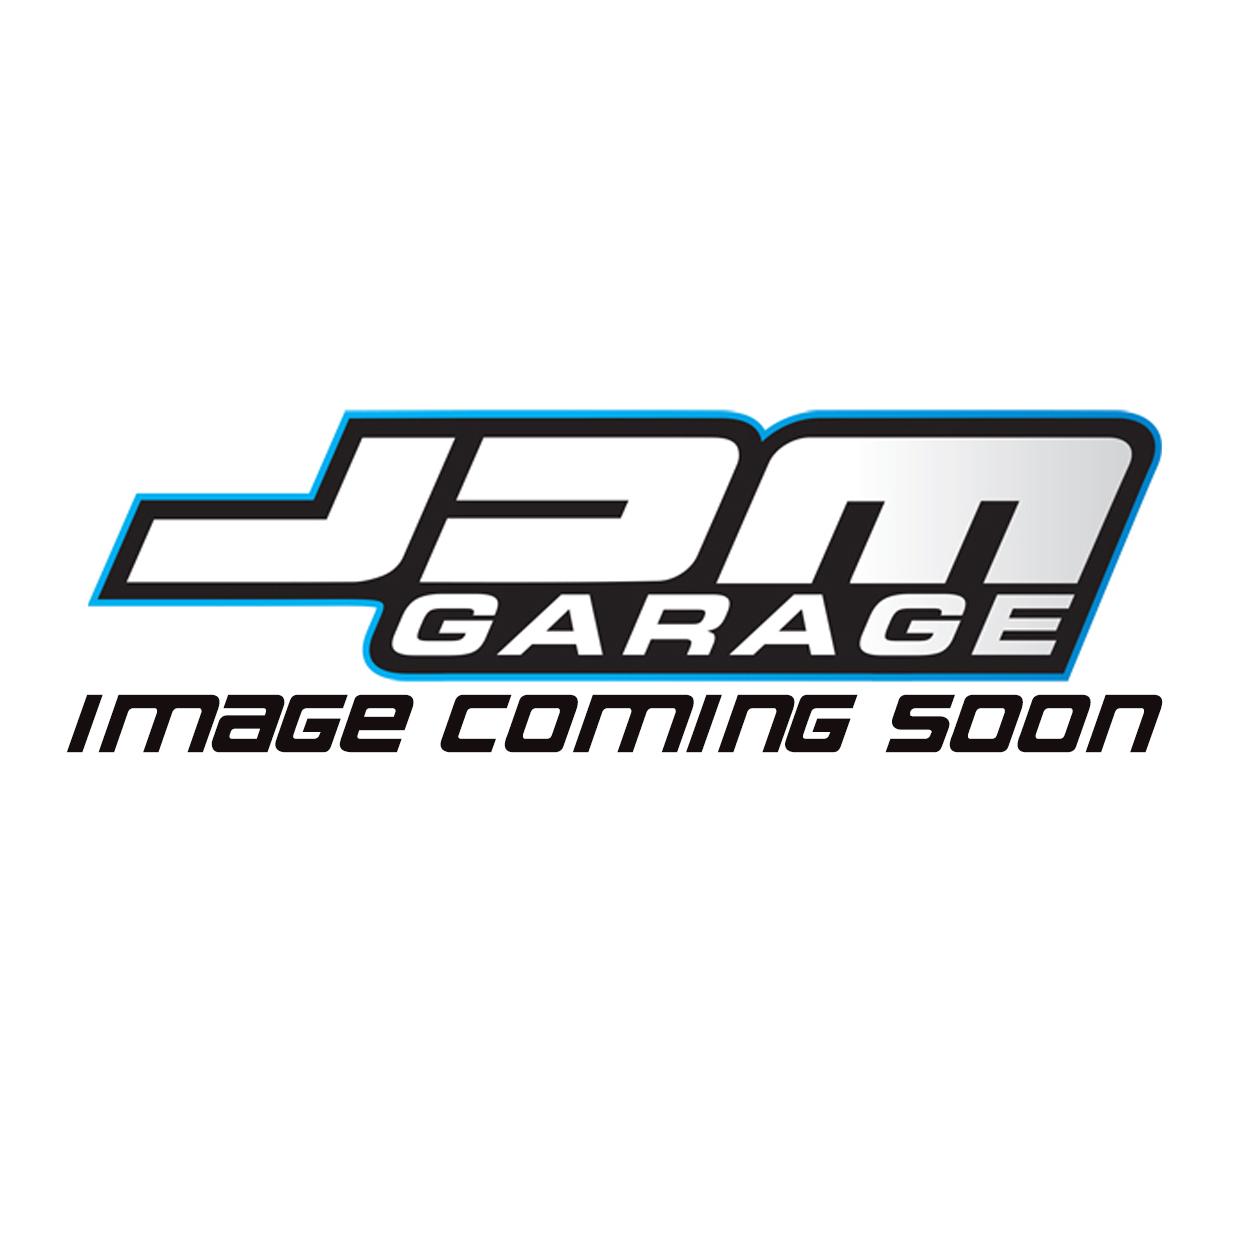 Genuine Nissan OEM Rear Diff Oil Seal Axle Side For Nissan R32 GTR R33 GTST Silvia S13 180SX S14 200SX